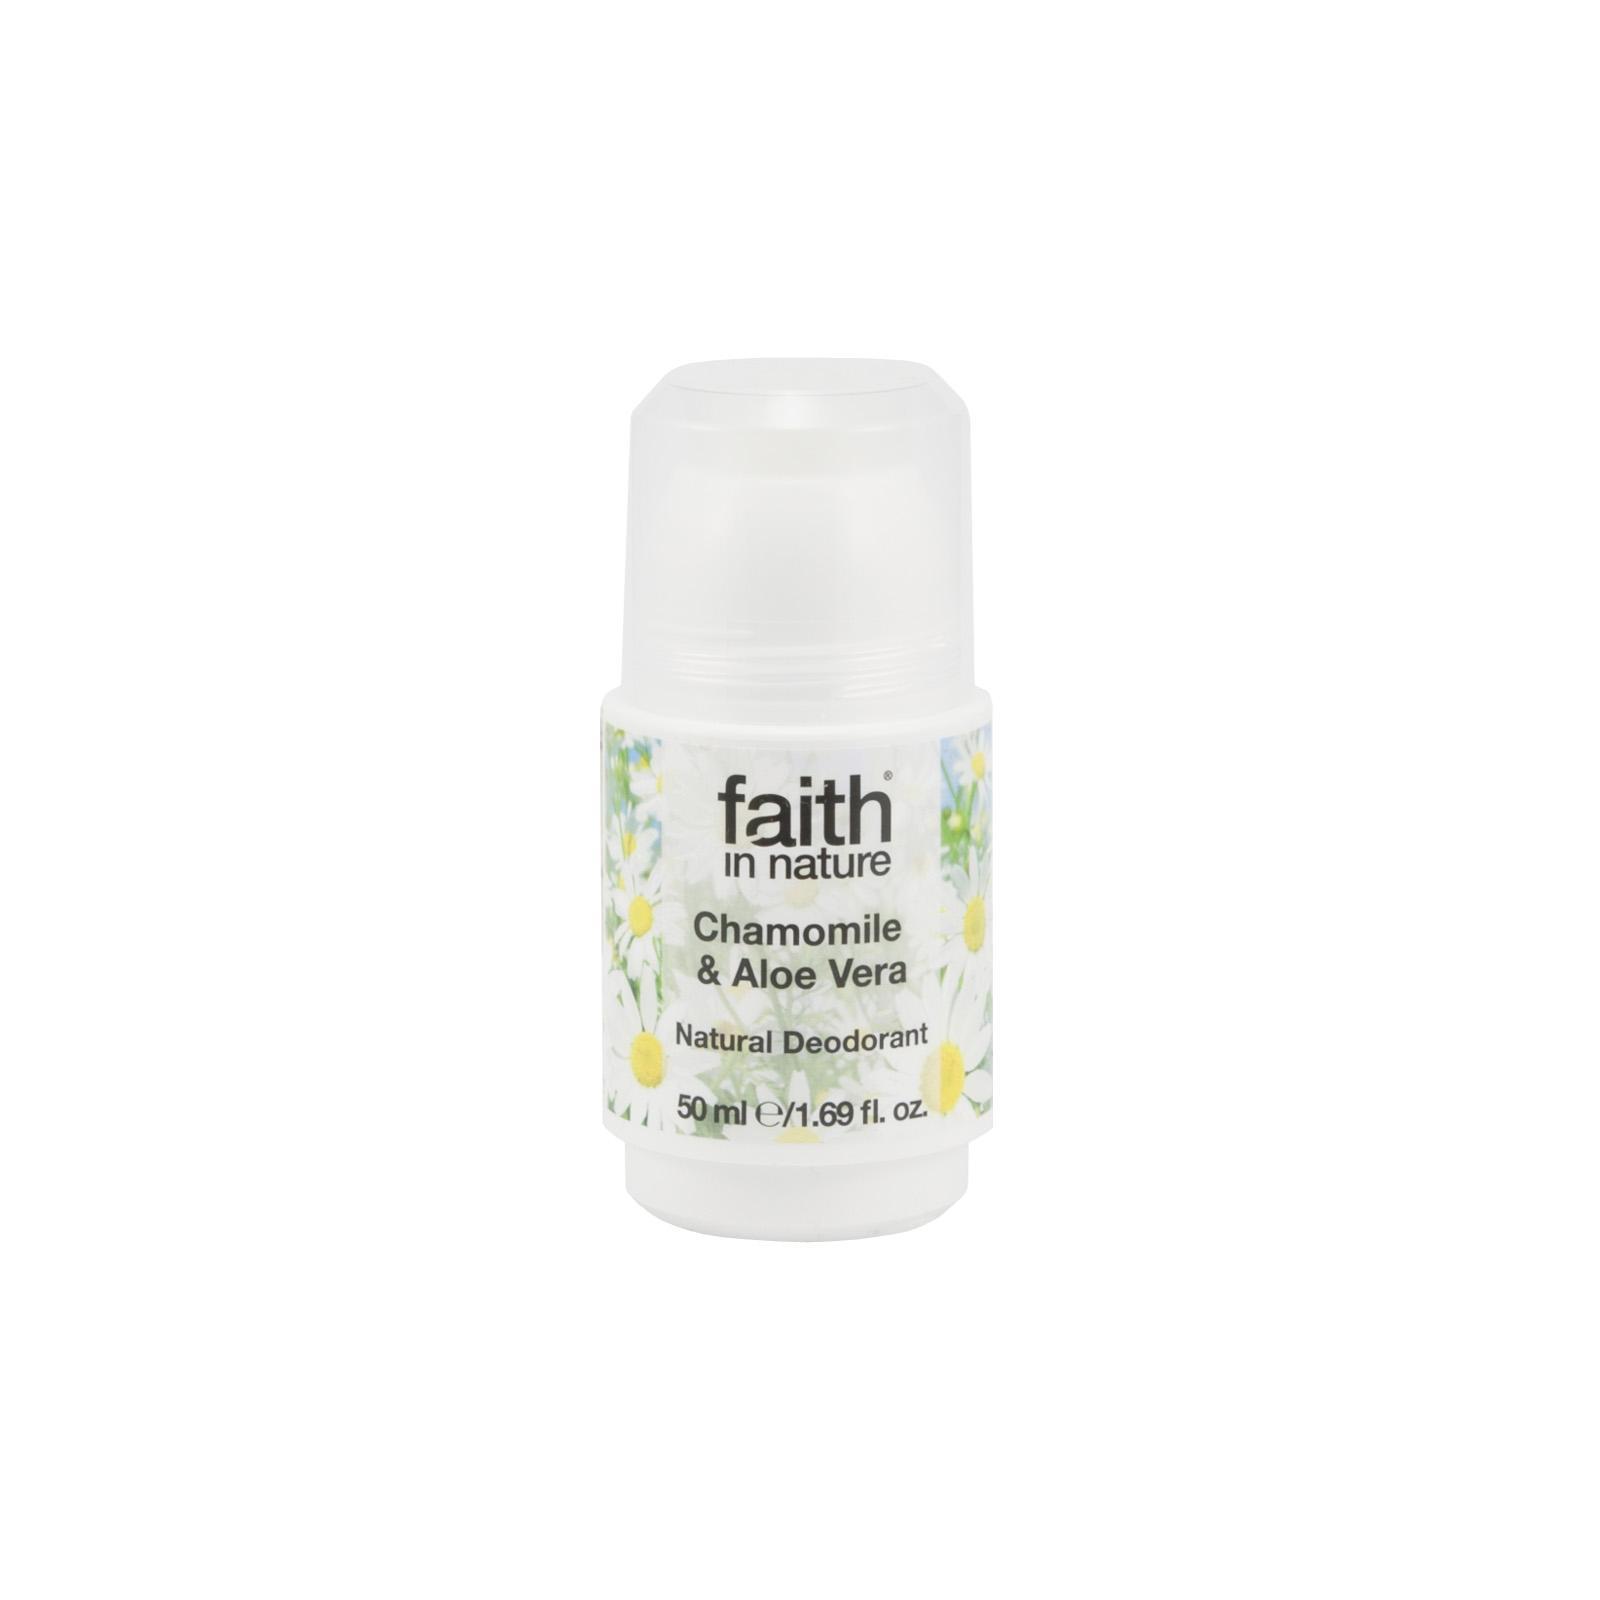 Faith in Nature, Kuličkový deo-krystal Bio Aloe Vera/Heřmánek, 50g